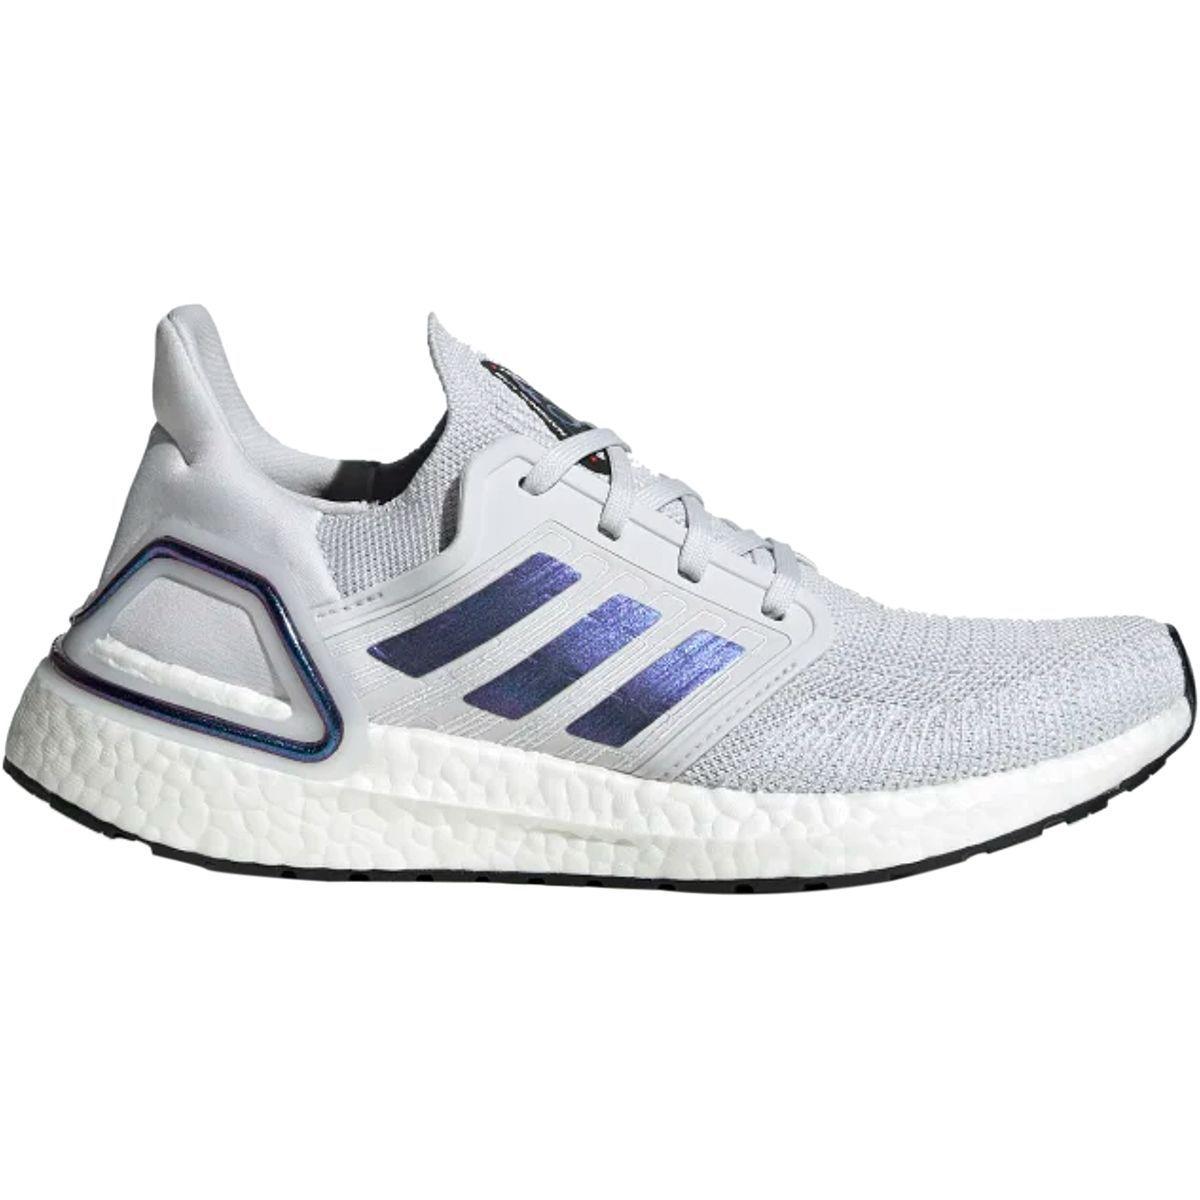 Adidas Ultraboost 20 Shoe - Women's in 2020 | Shoes, Adidas ...